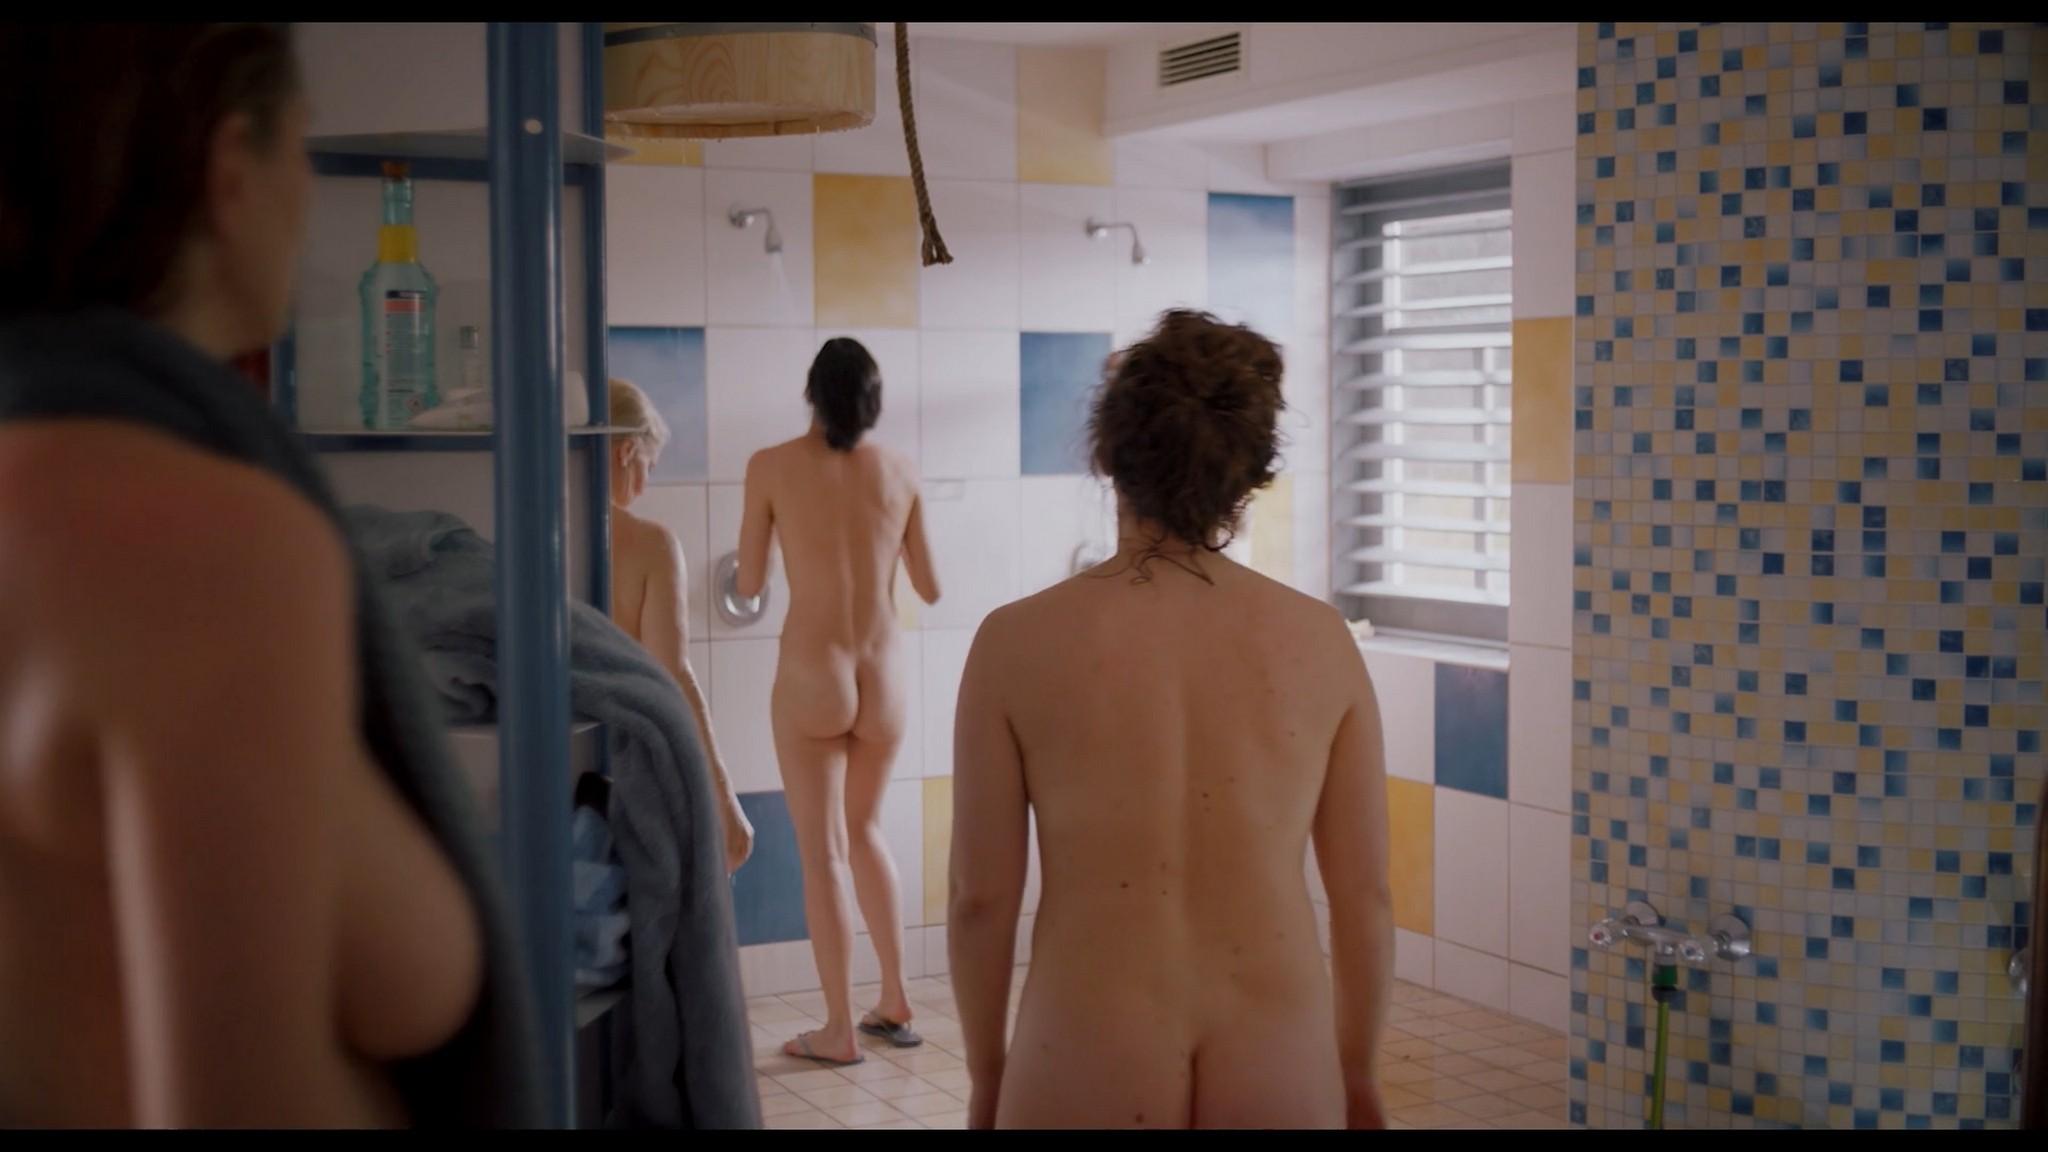 Antonia Bill nude full frontal Amanda da Gloria Helene Blechinger and others nude too Hitzig Ein Saunagang DE 2021 1080p 4